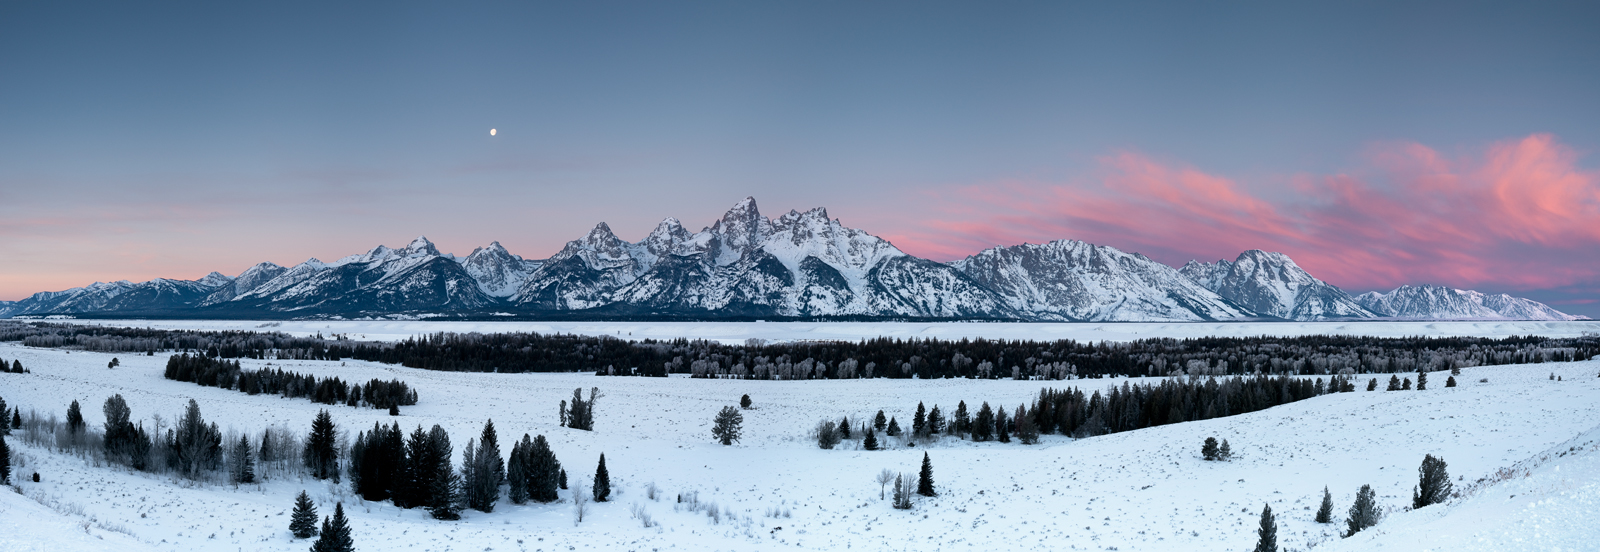 Grand Teton National Park, panorama, sunrise, winter, landscape, moonset, paysage, hiver, photo